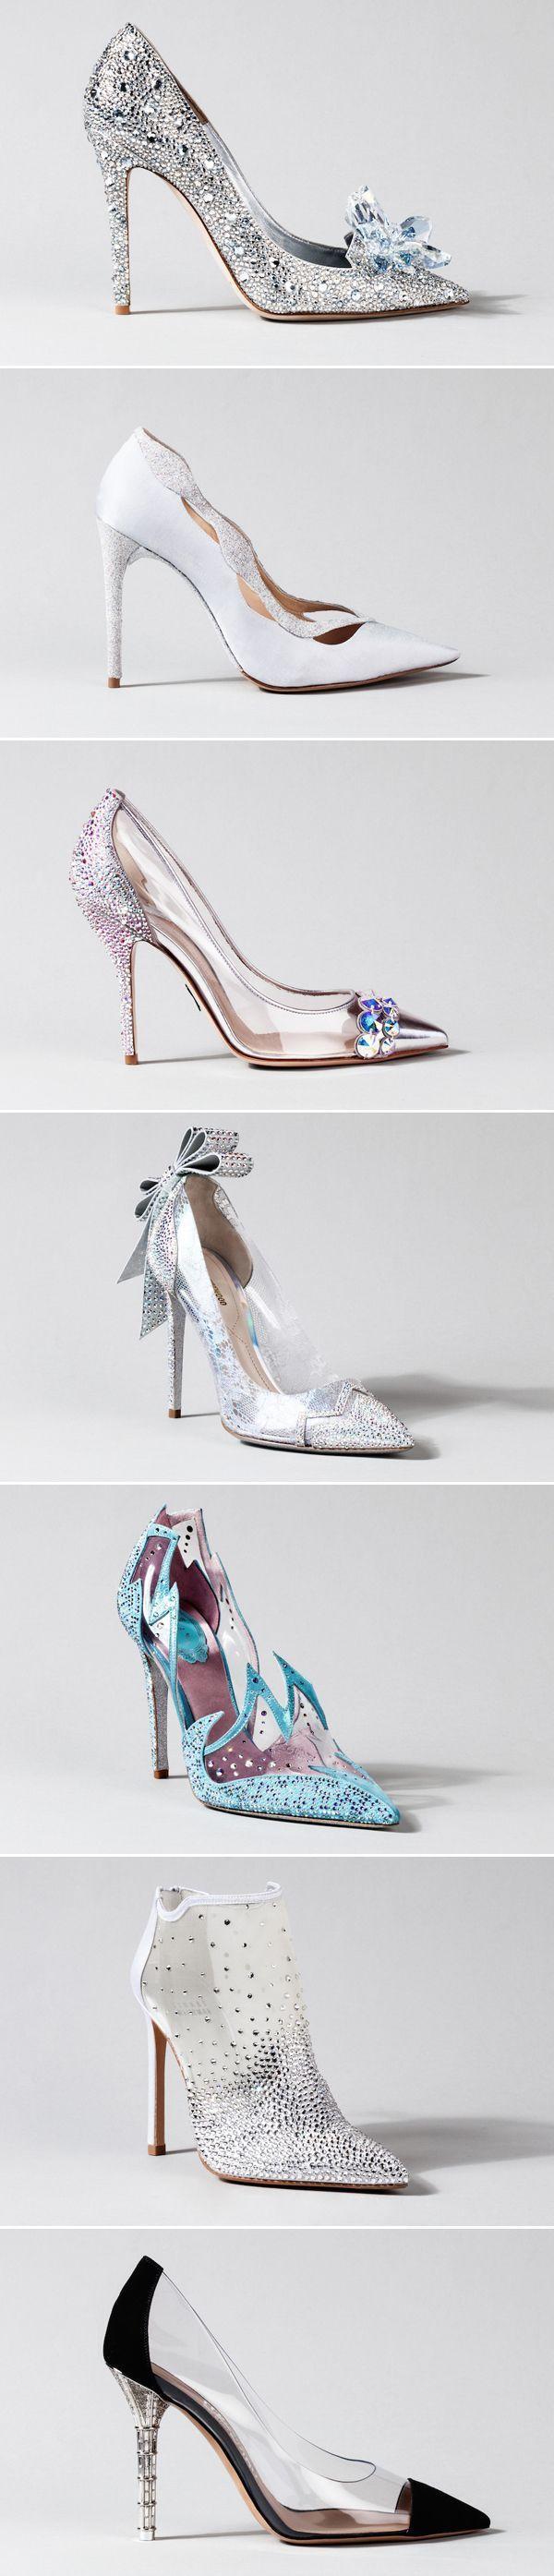 Mariage - 15 Stunning Cinderella-Inspired Wedding Shoes